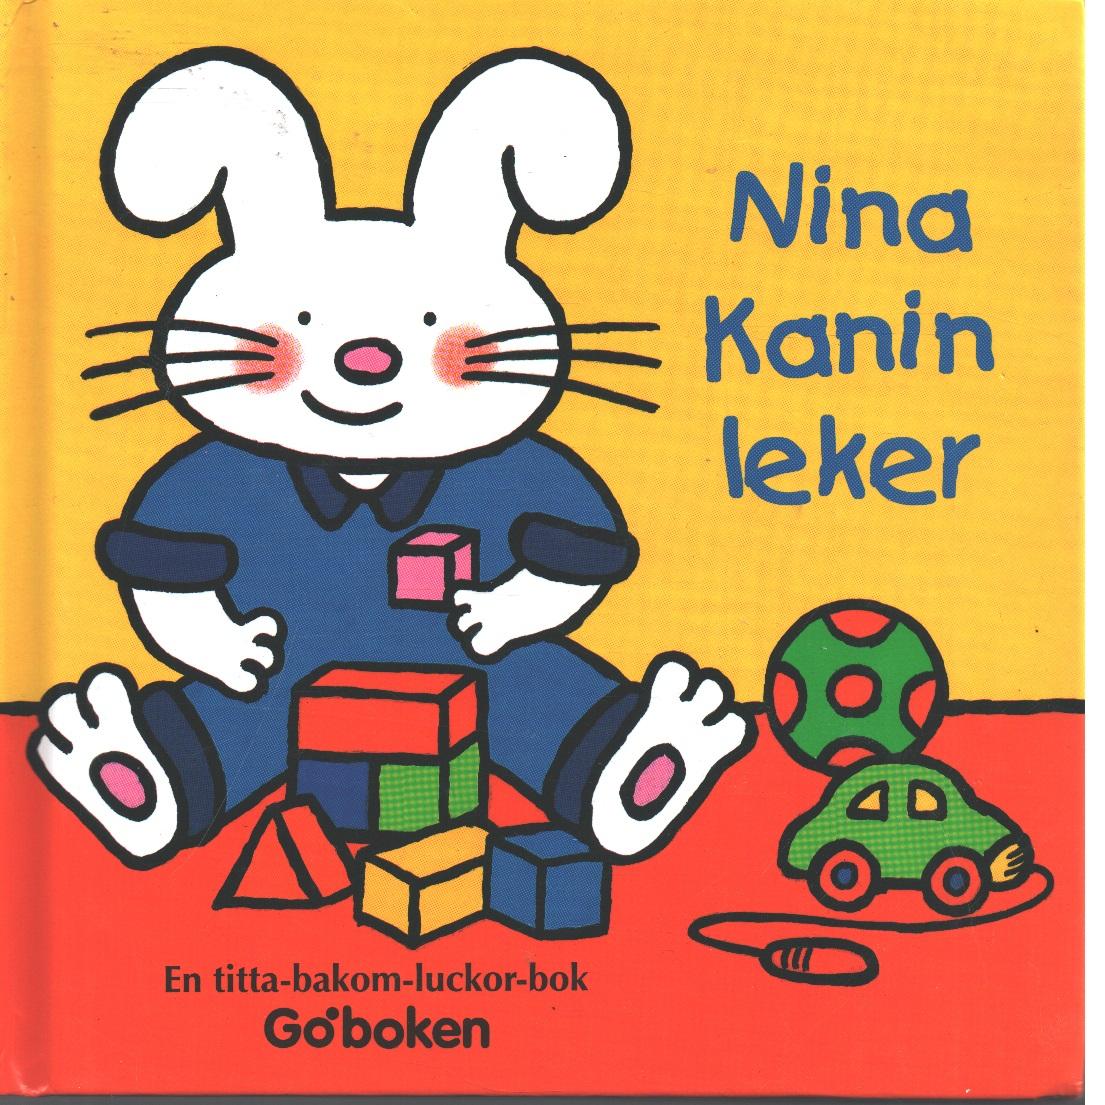 Nina Kanin leker : en titta-bakom-luckor-bok - Coats, Lucy